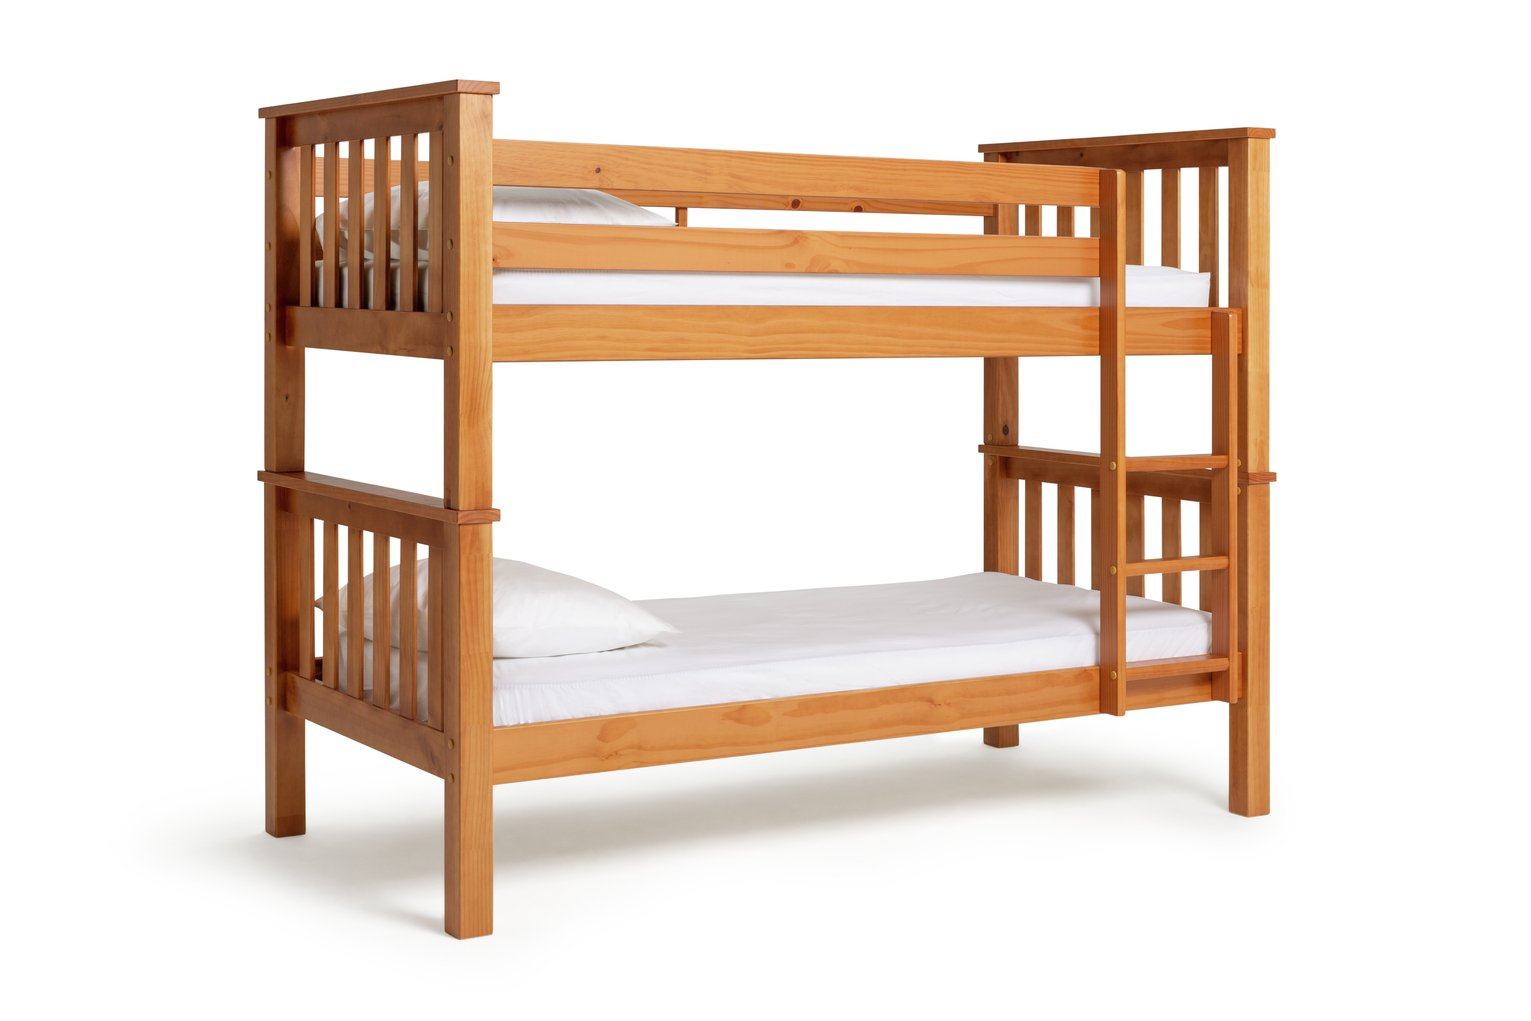 Argos Home Heavy Duty Pine Bunk Bed & 2 Kids Mattresses